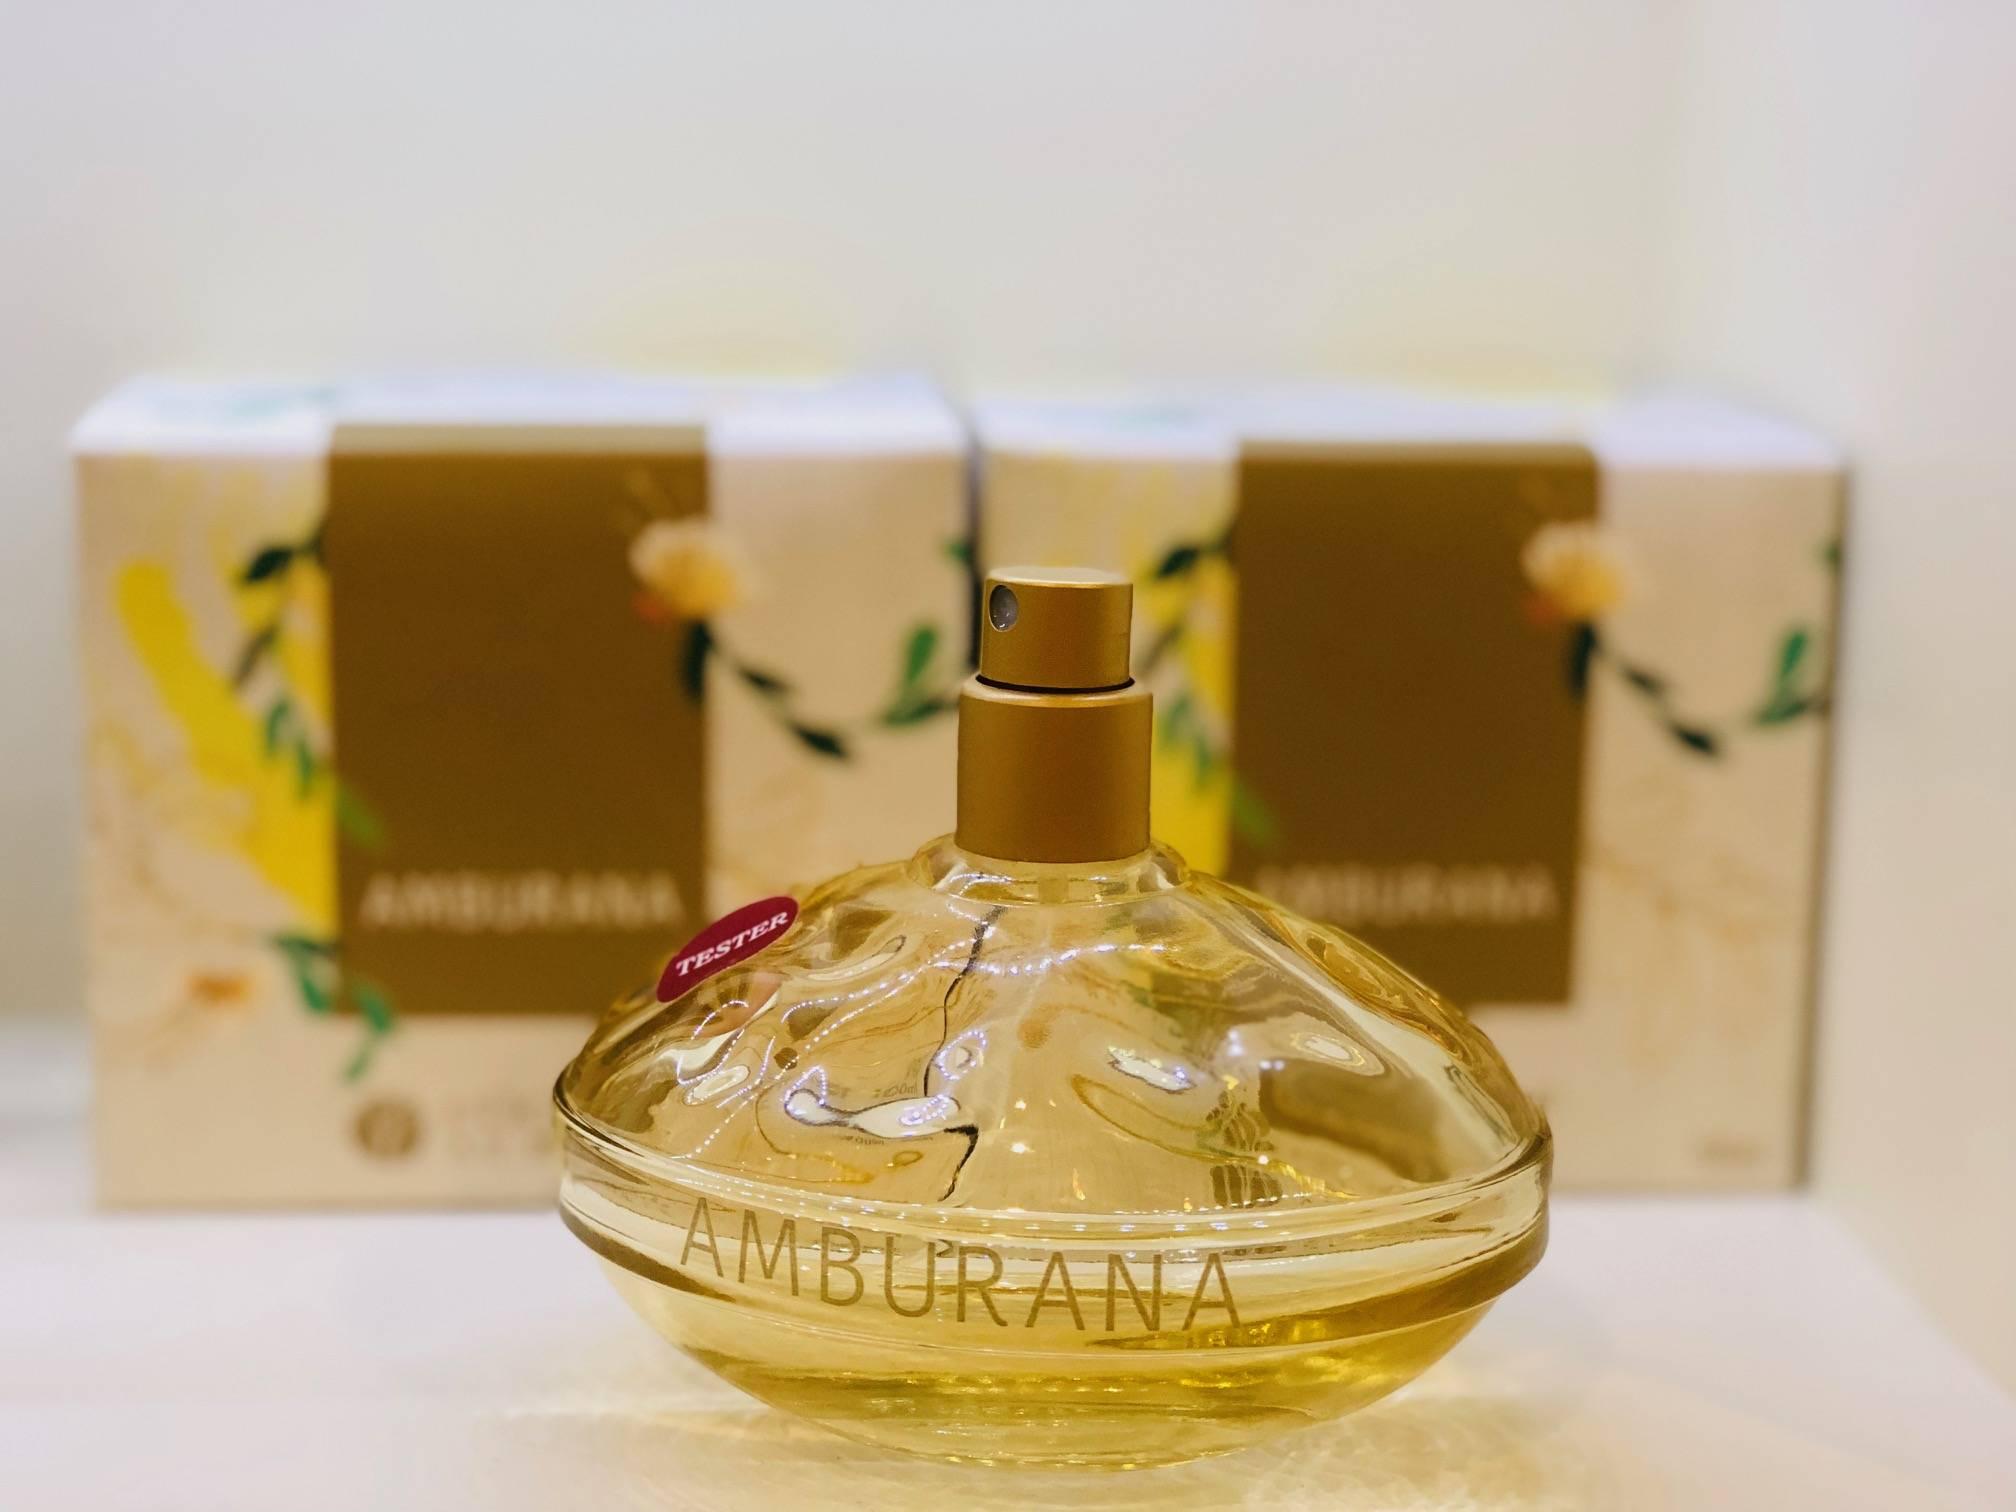 www.juicysantos.com.br - perfume amburana da l'occitane au brésil em santos